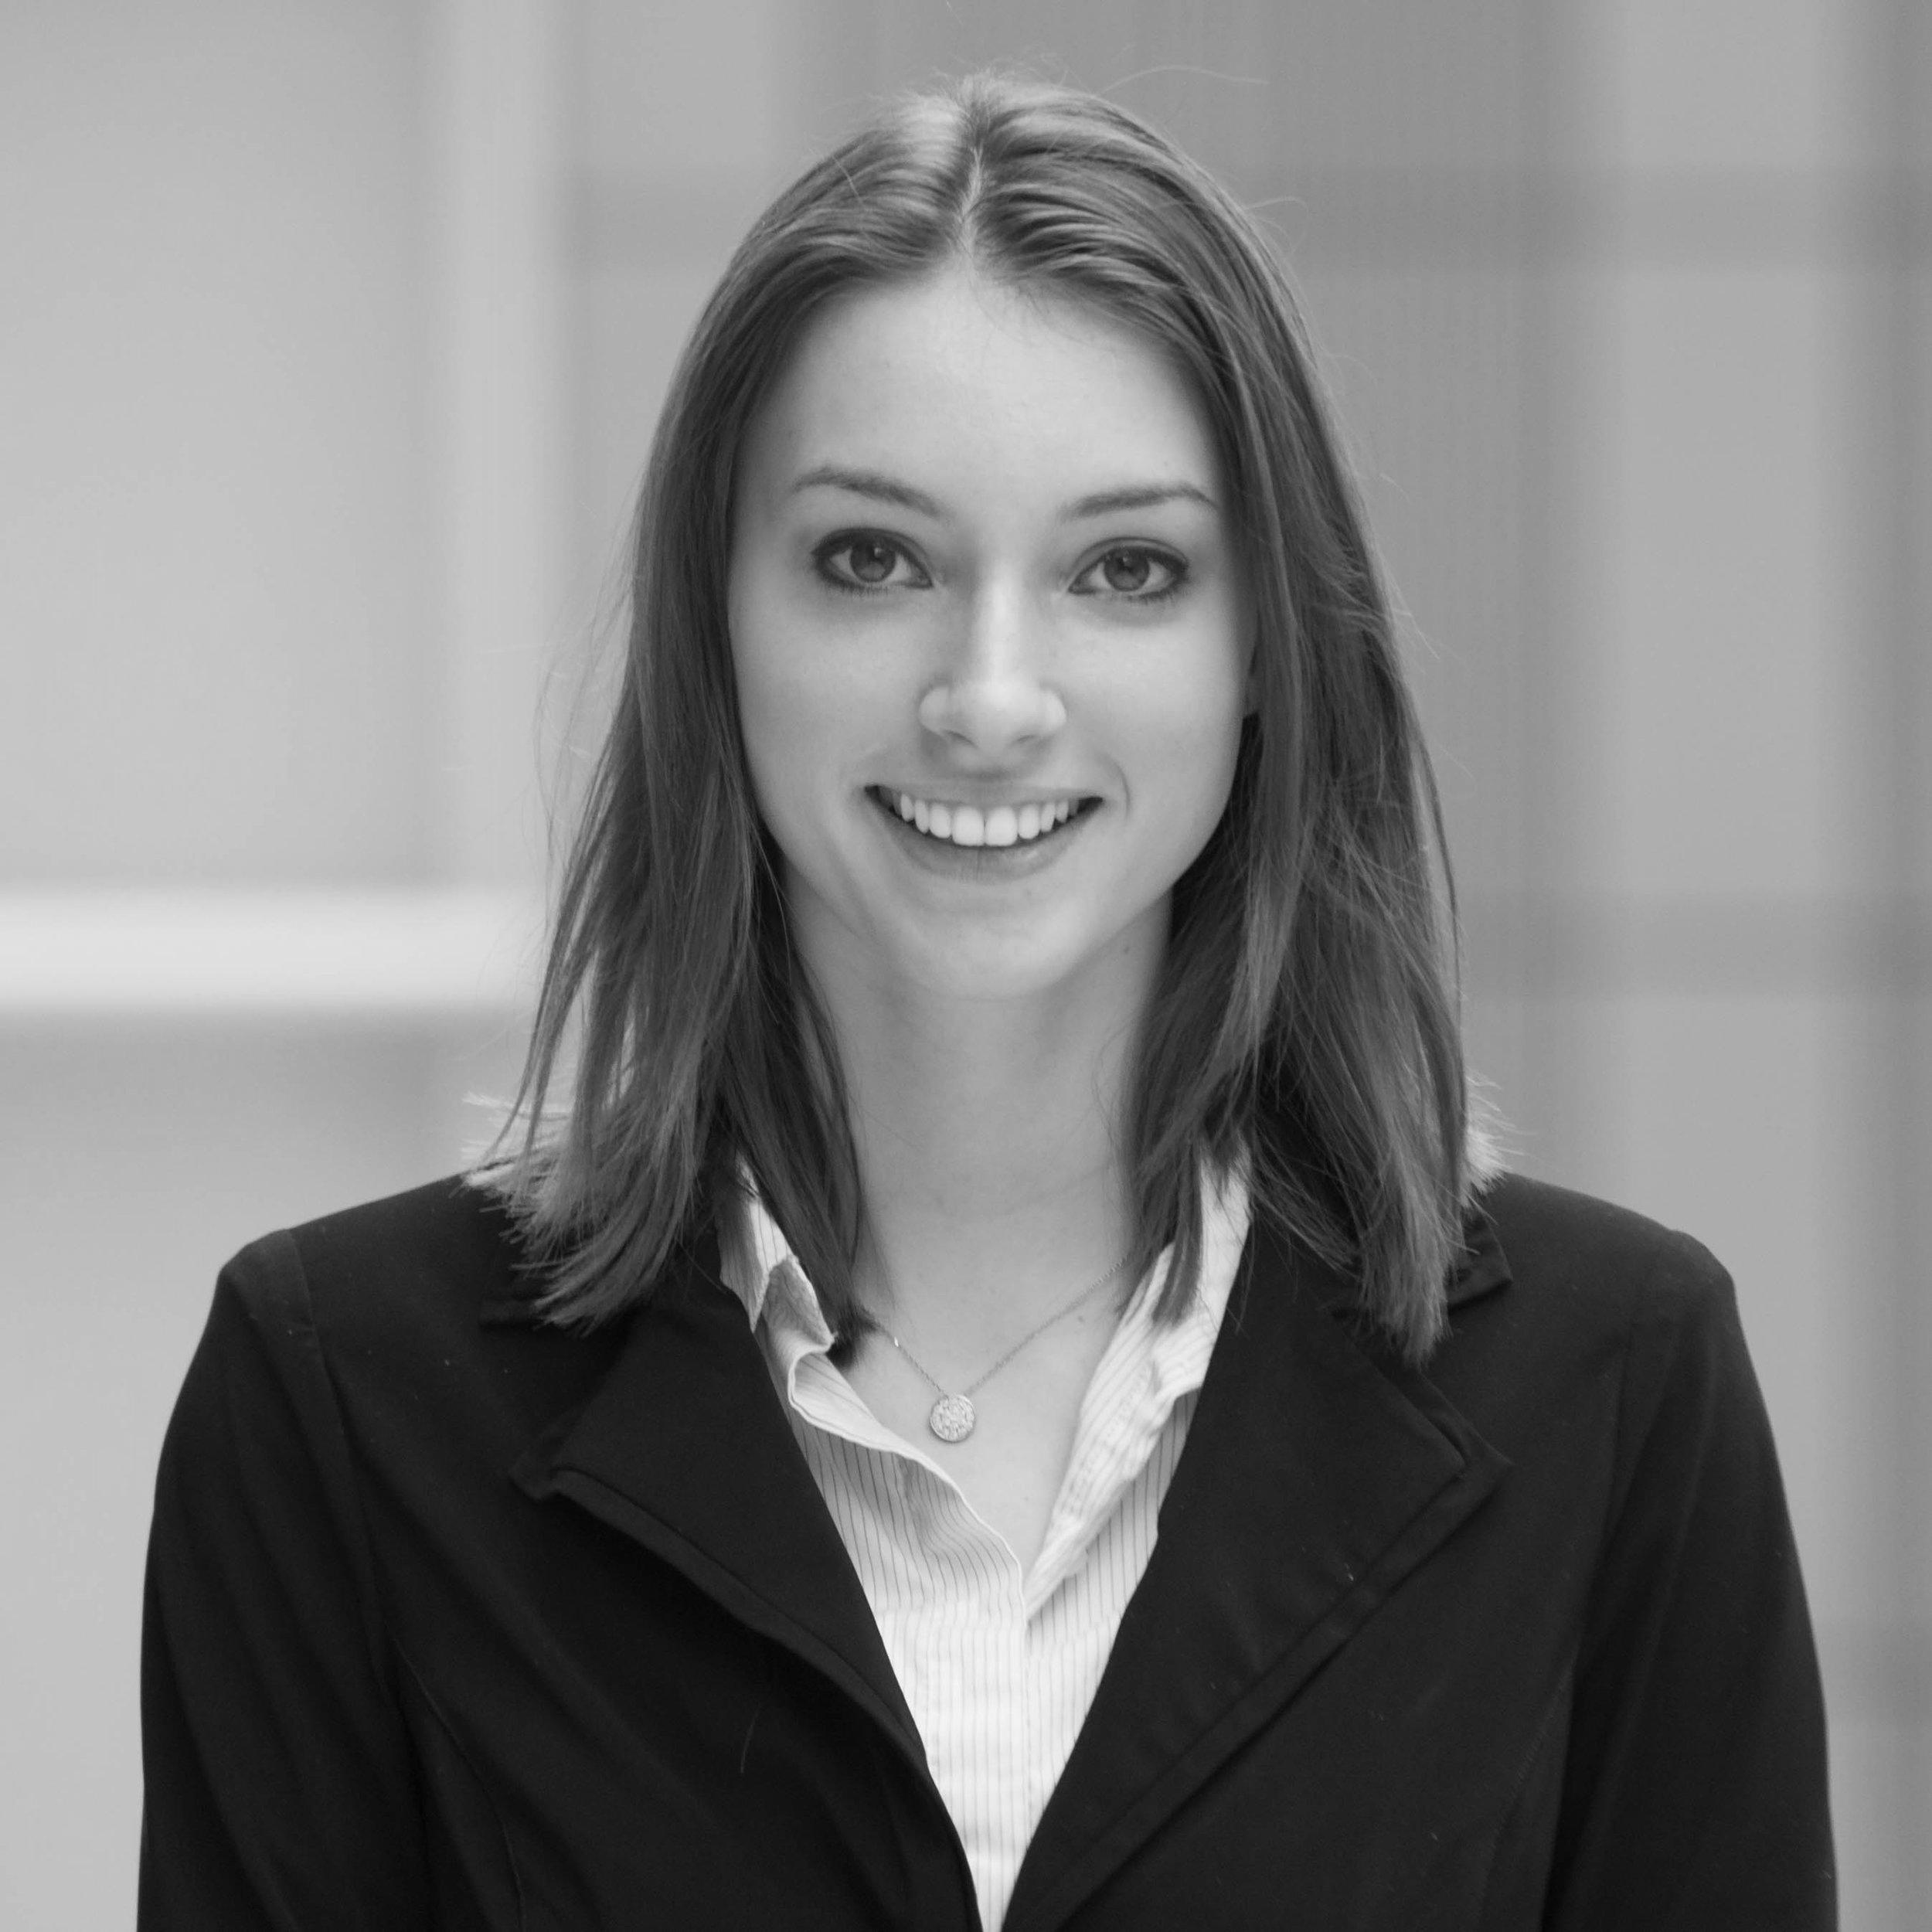 Stephanie van Houten